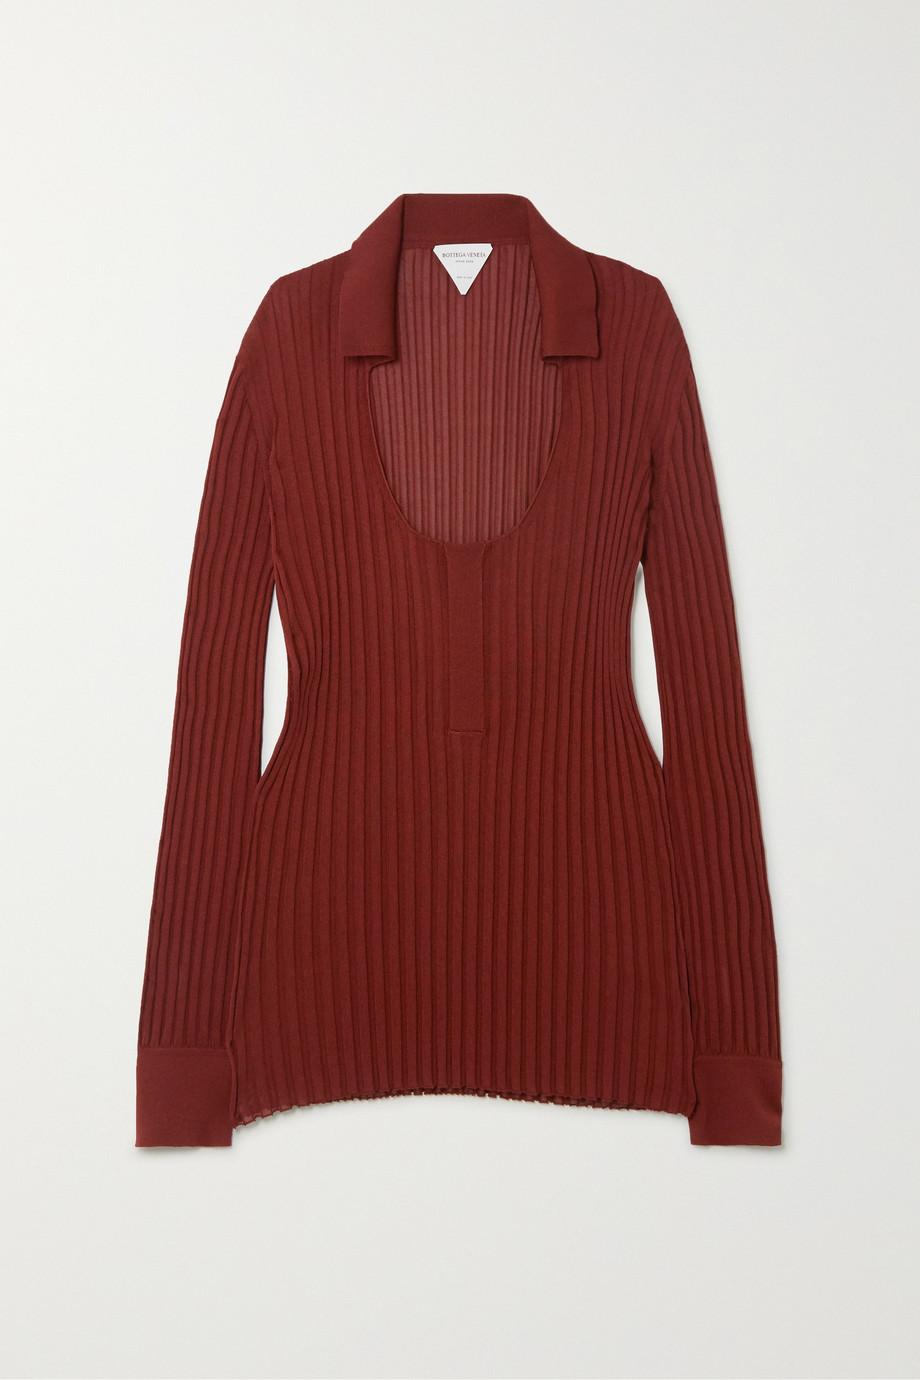 Bottega Veneta Ribbed silk-blend sweater